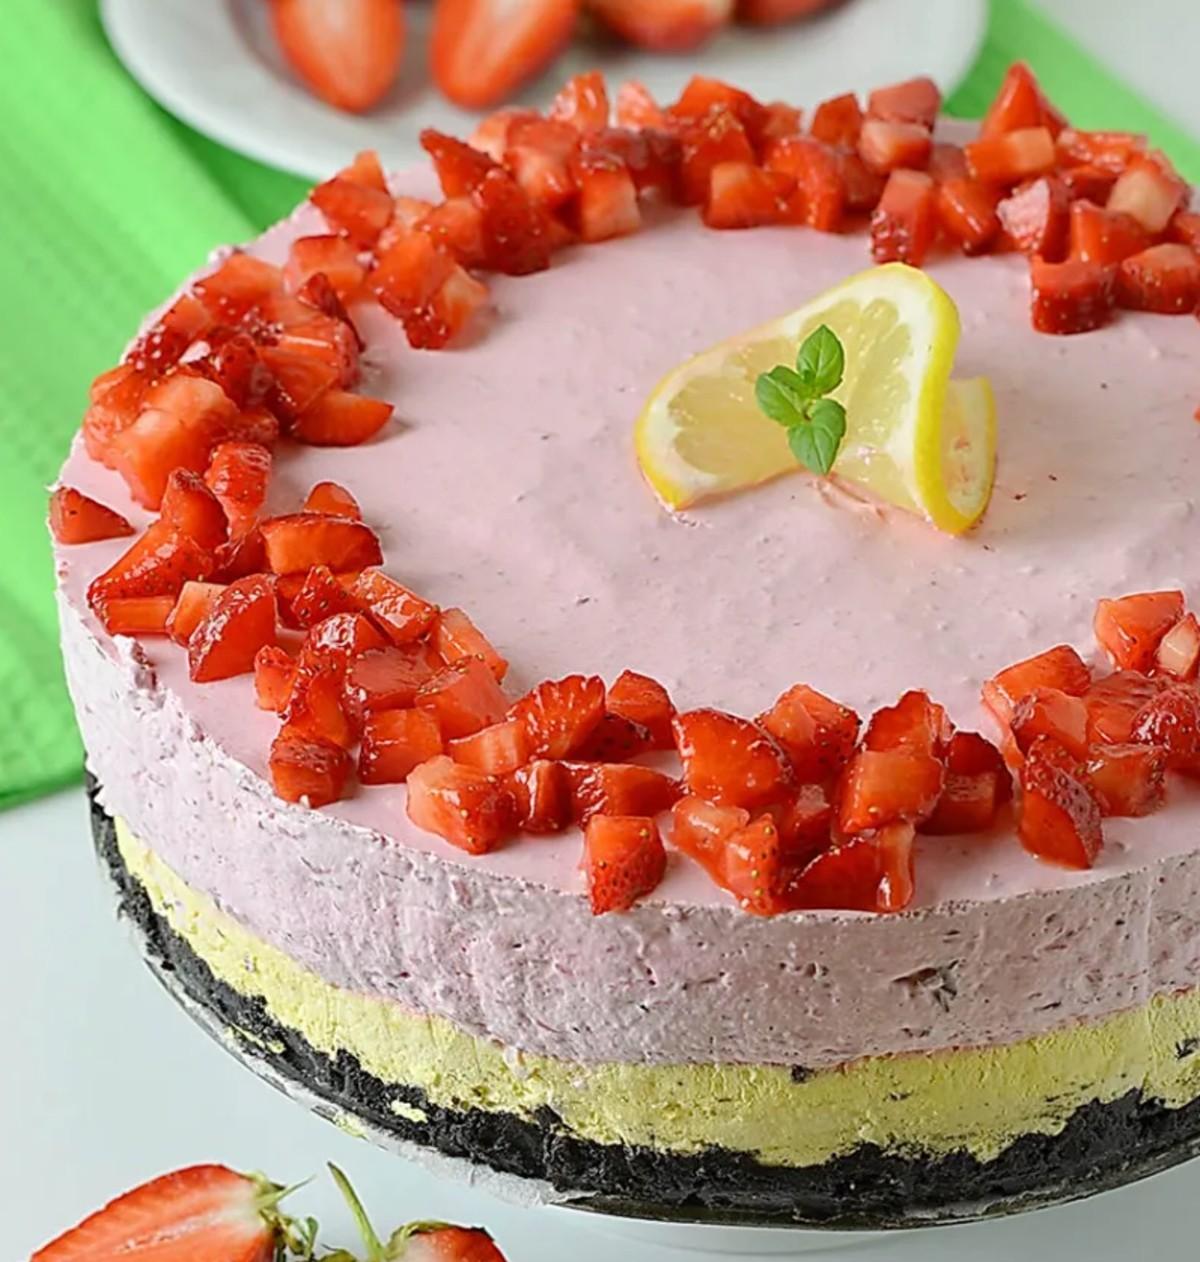 strawberry lemonade cookbook